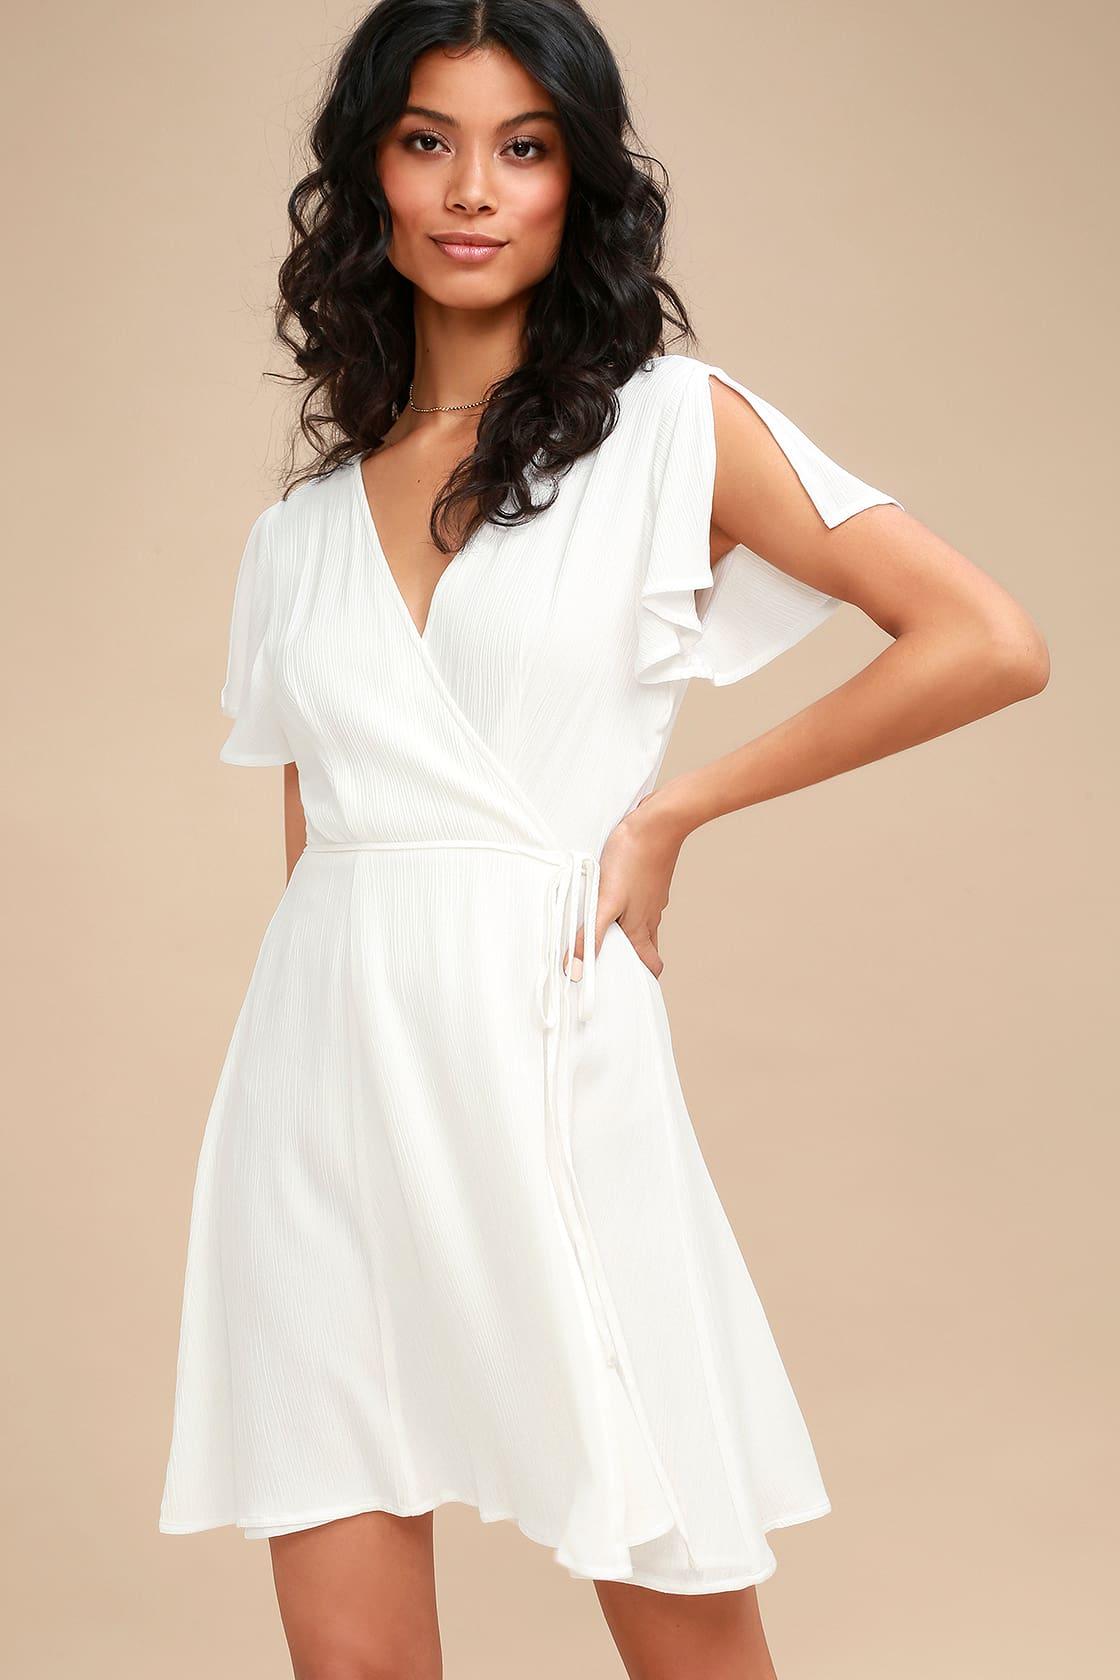 Cute white grad dress